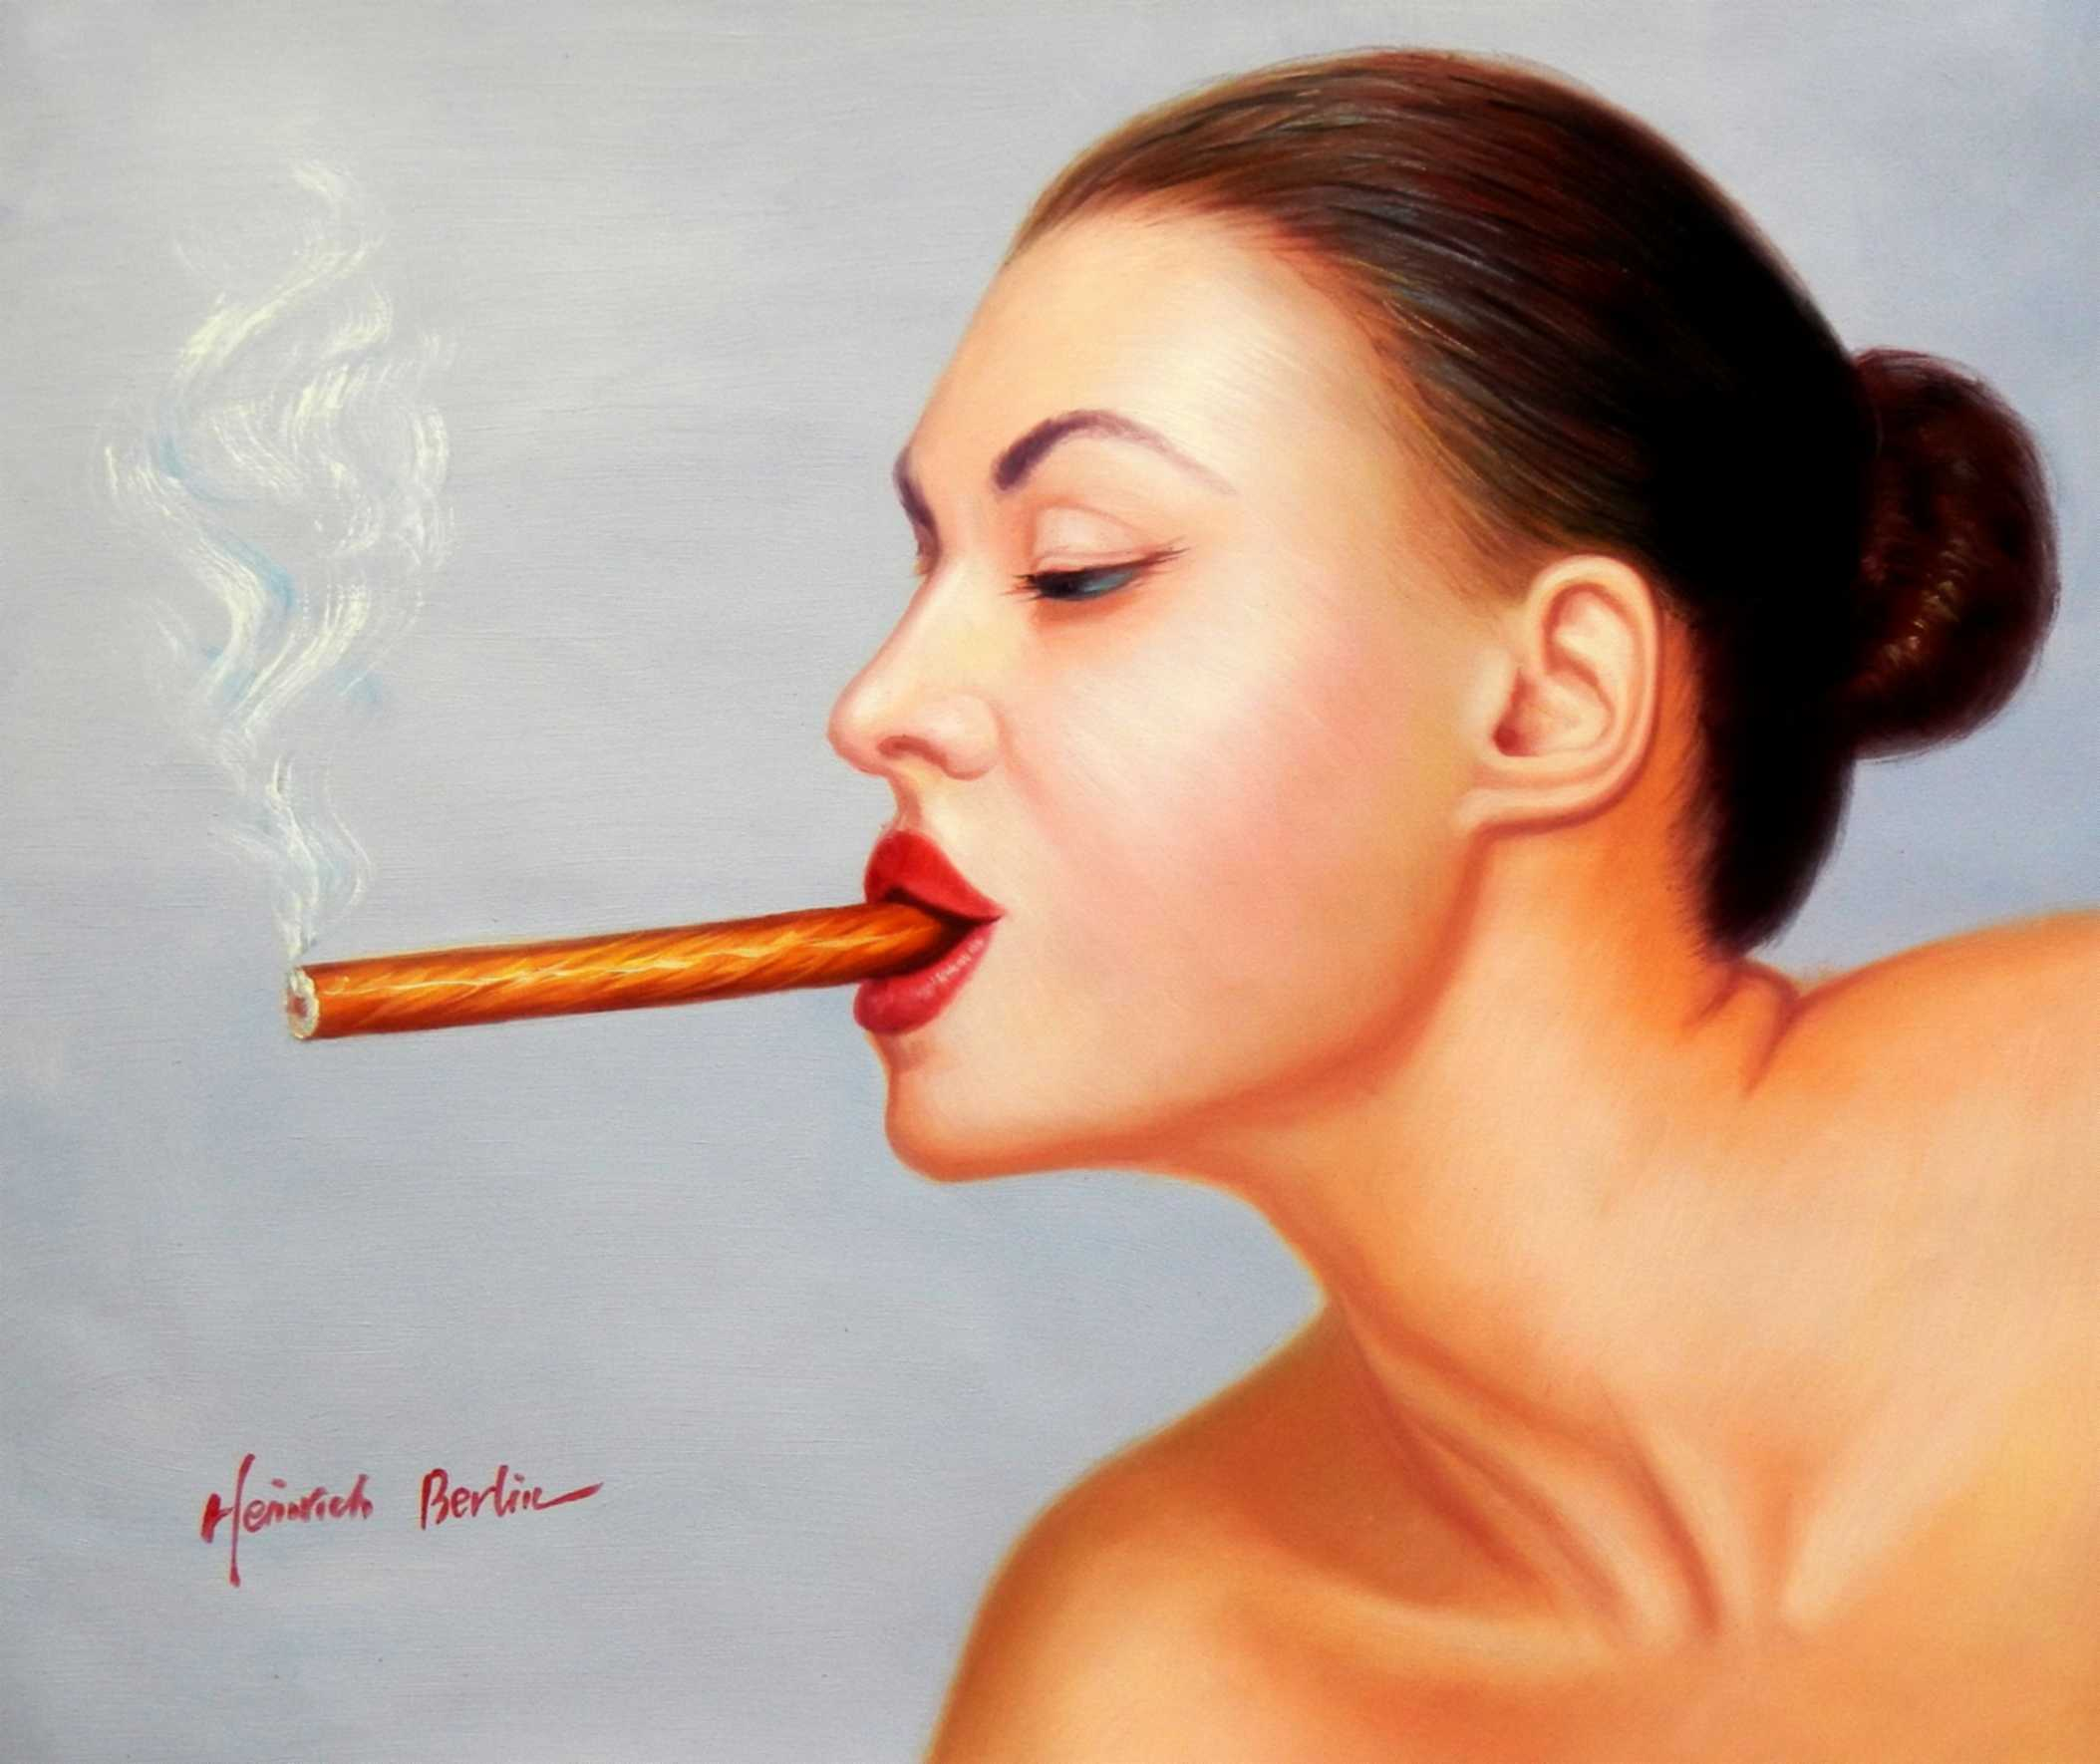 Modern Art - Frau mit Cohiba Zigarre c95777 50x60cm exquisites Ölgemälde